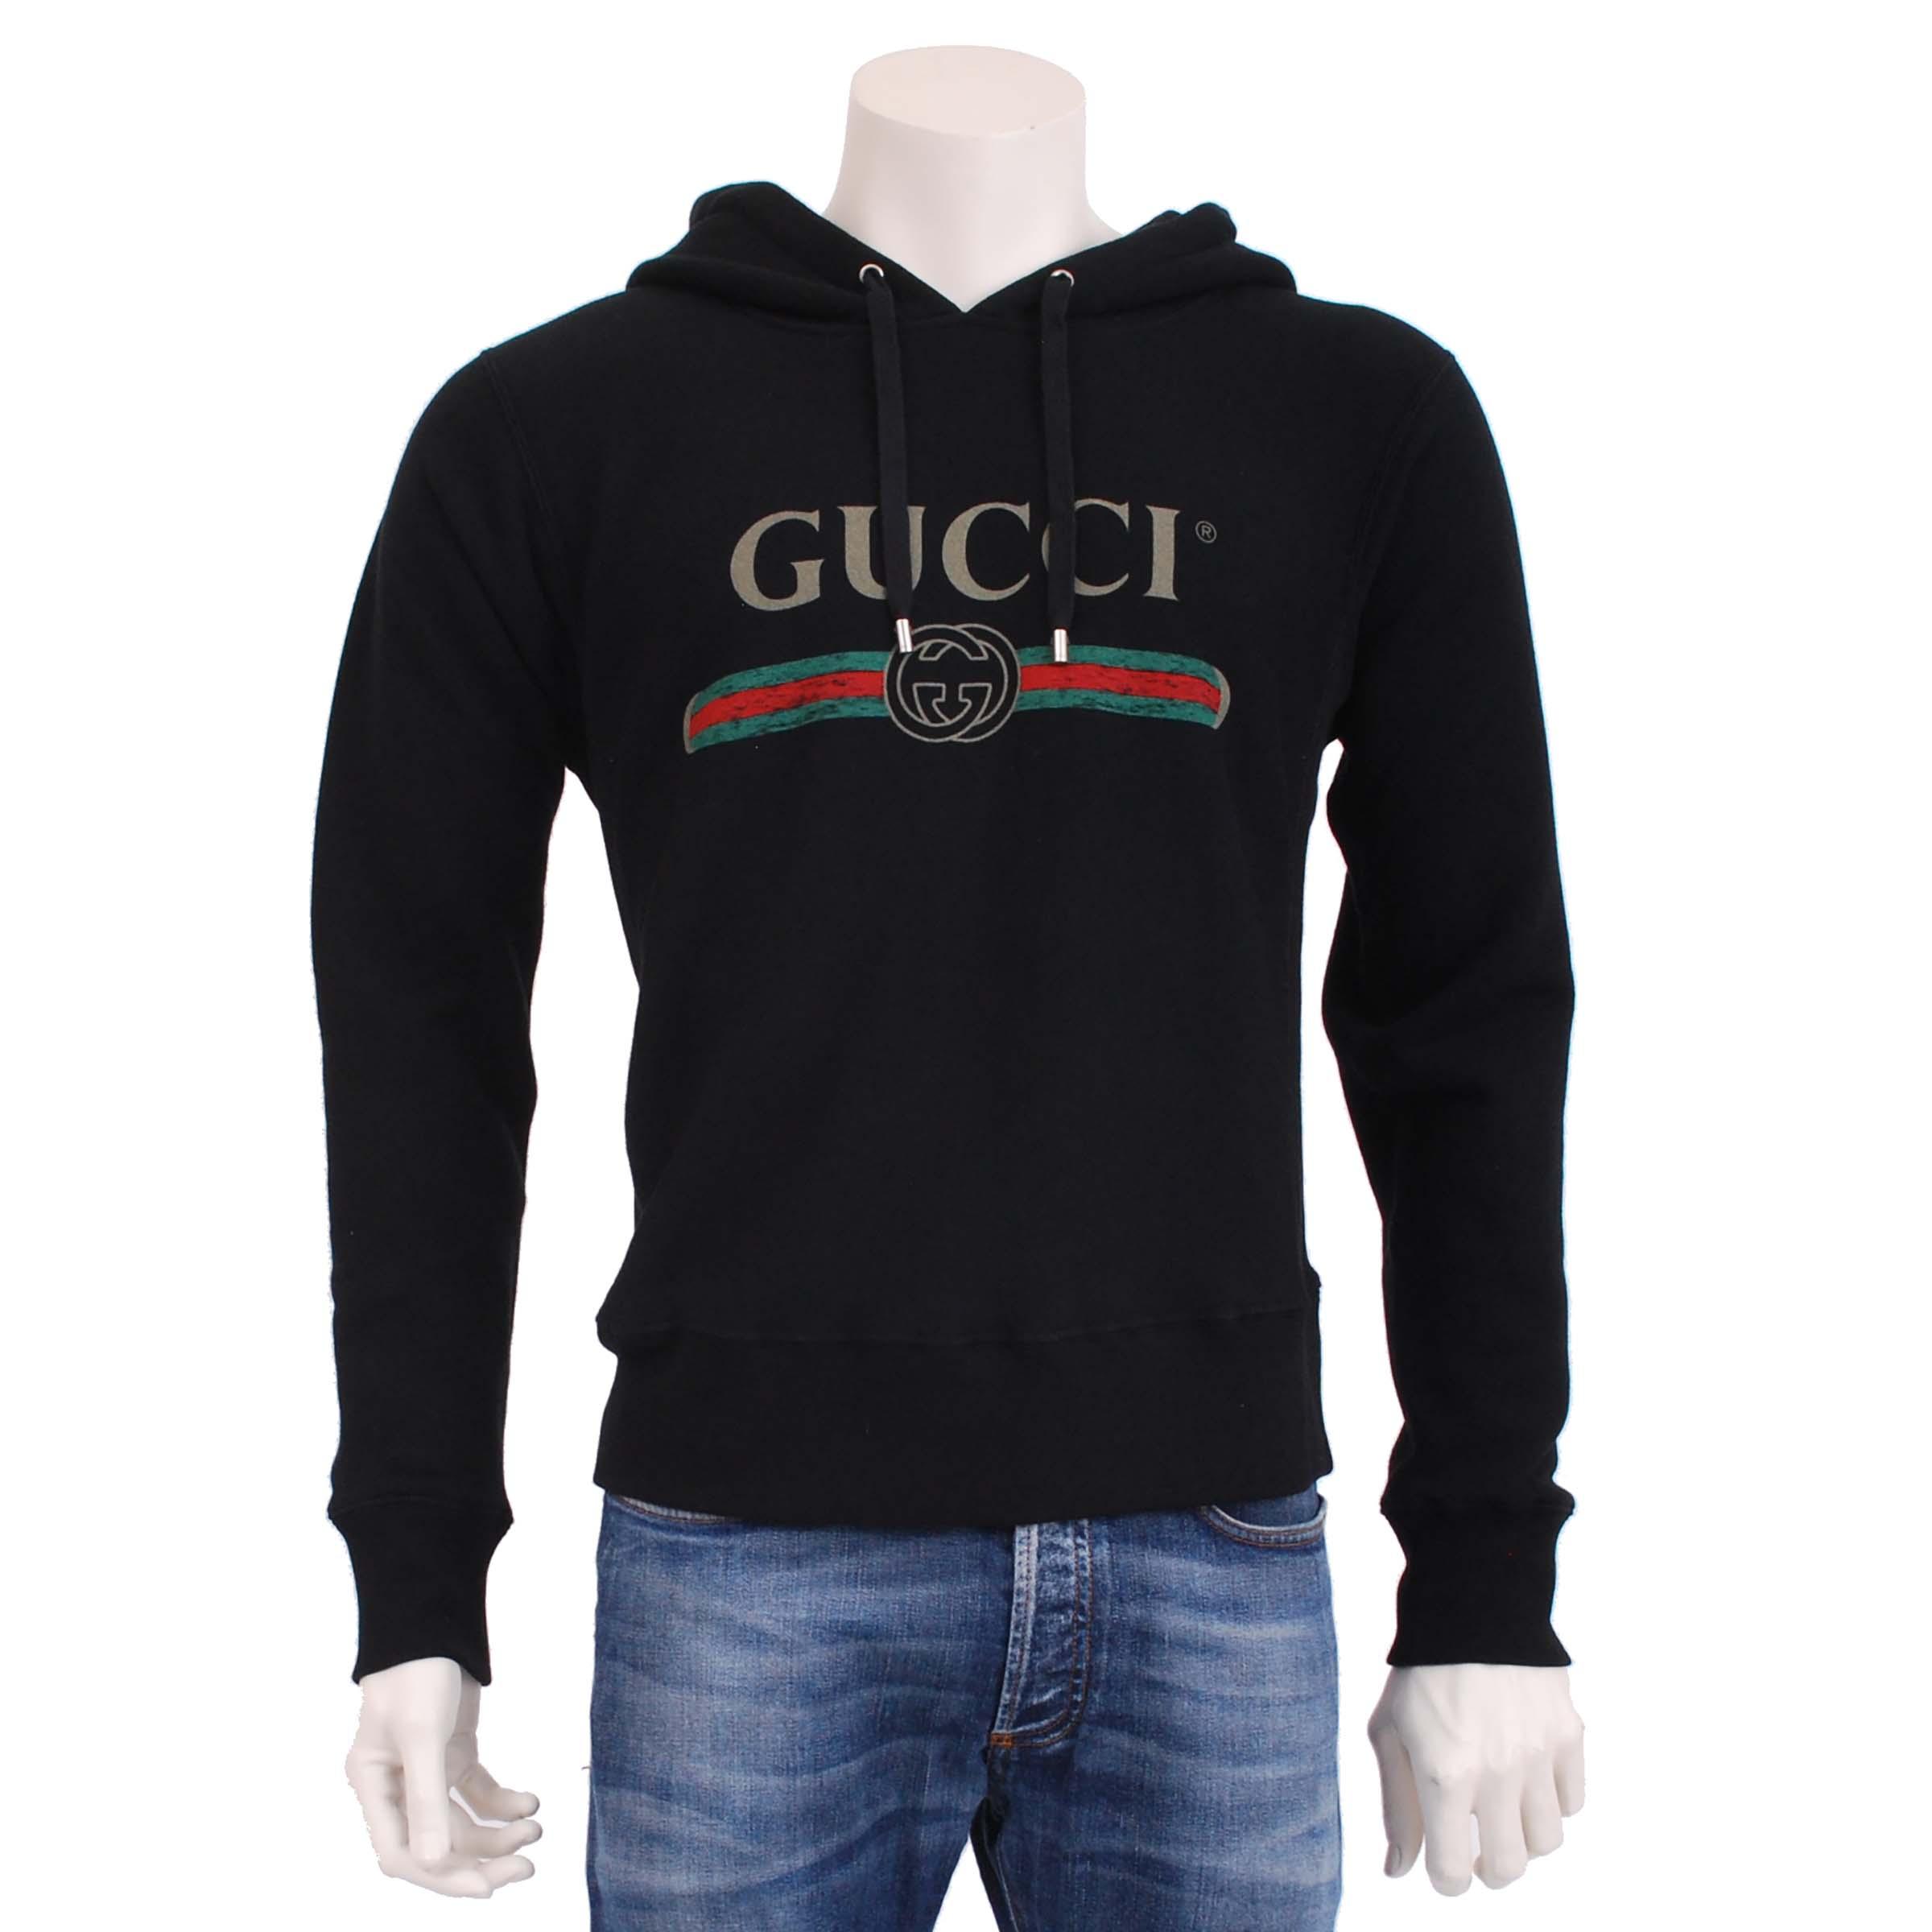 c7797f47f0d6 Gucci Black Cotton Gucci Logo Print Hooded Sweatshirt | Grailed